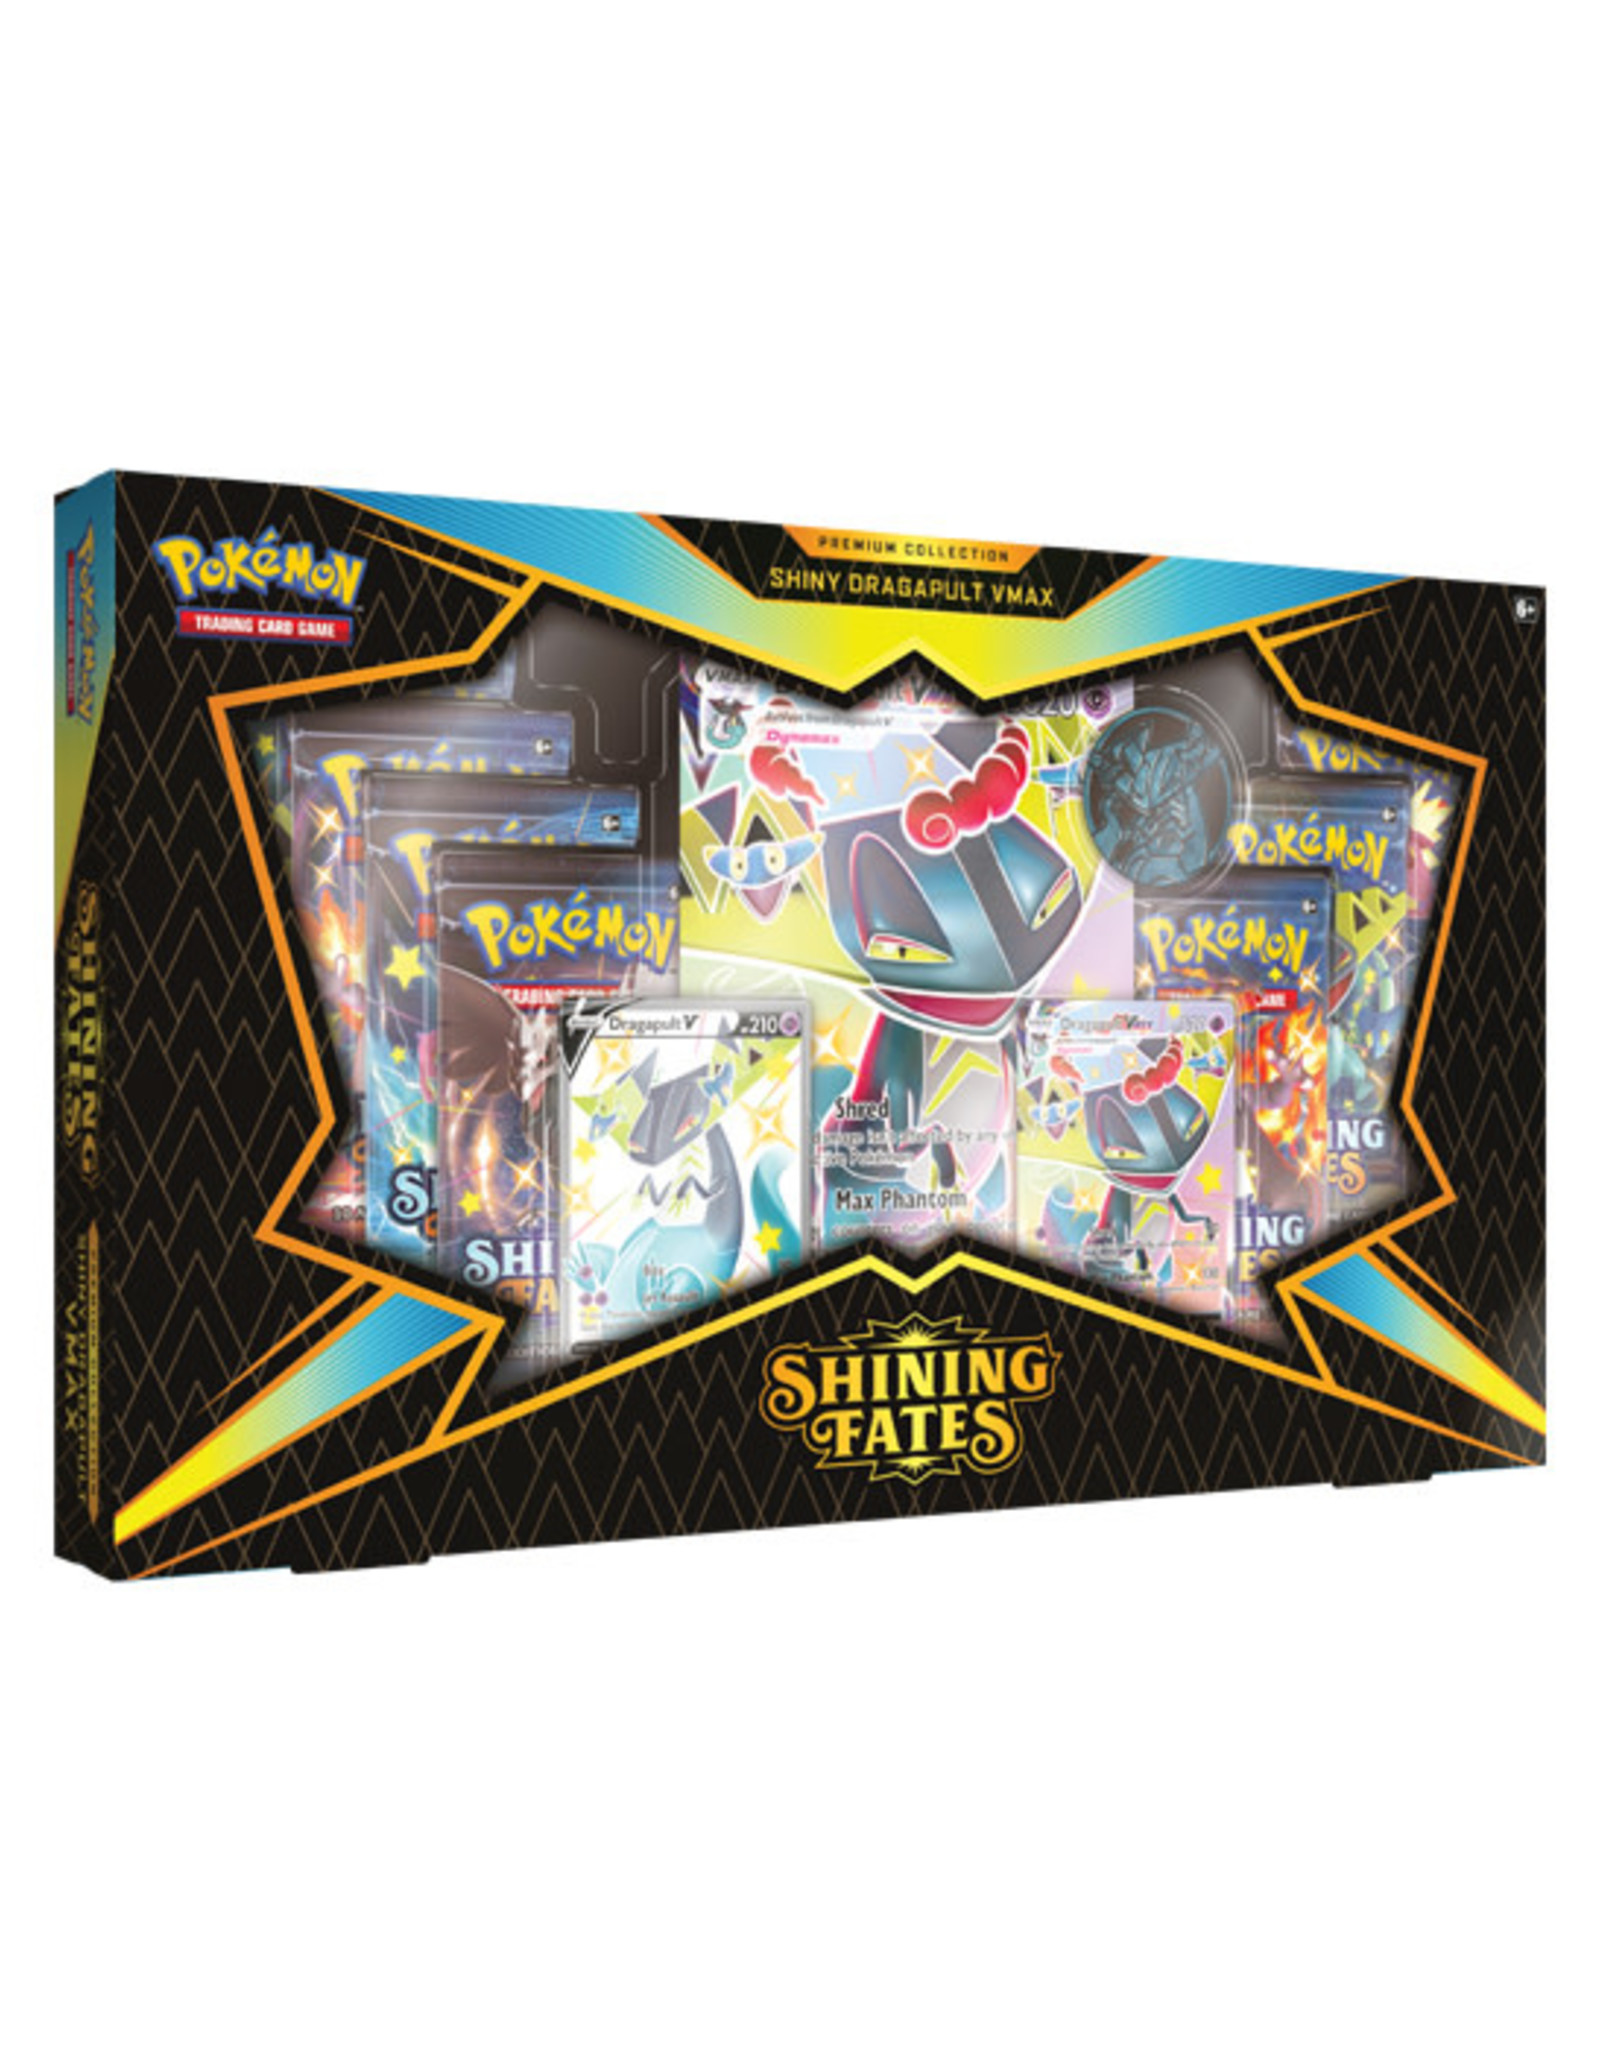 Pokemon Pokemon: Shining Fates - Premium Collection - Shiny Dragapult VMAX